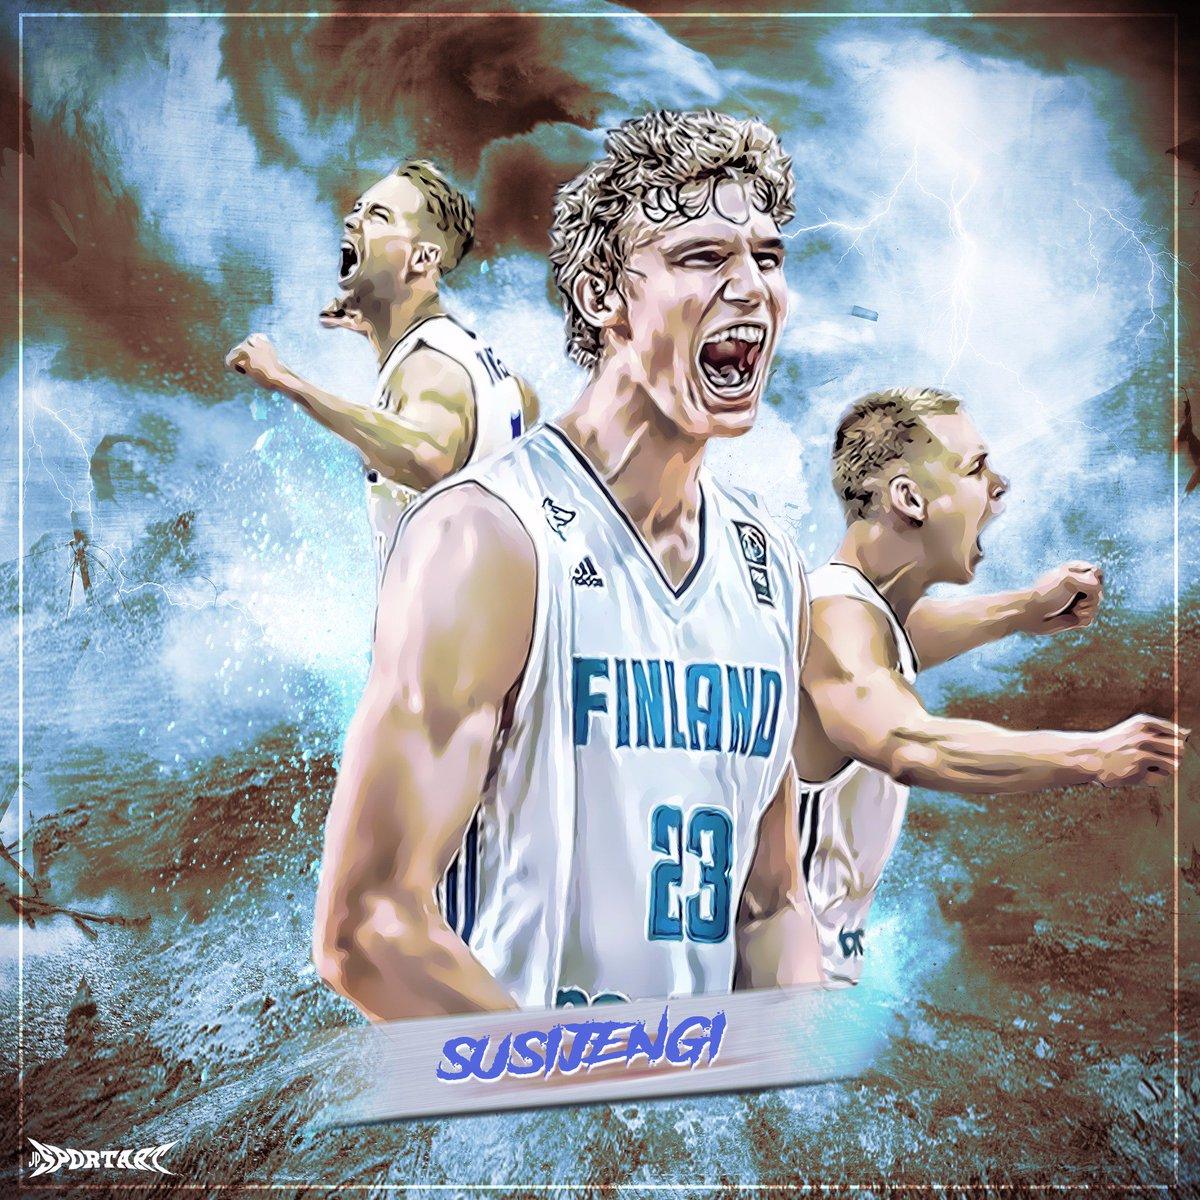 What did wolf say! #Susijengi #Aaauuu! #EuroBasket2017 #gameday https:...